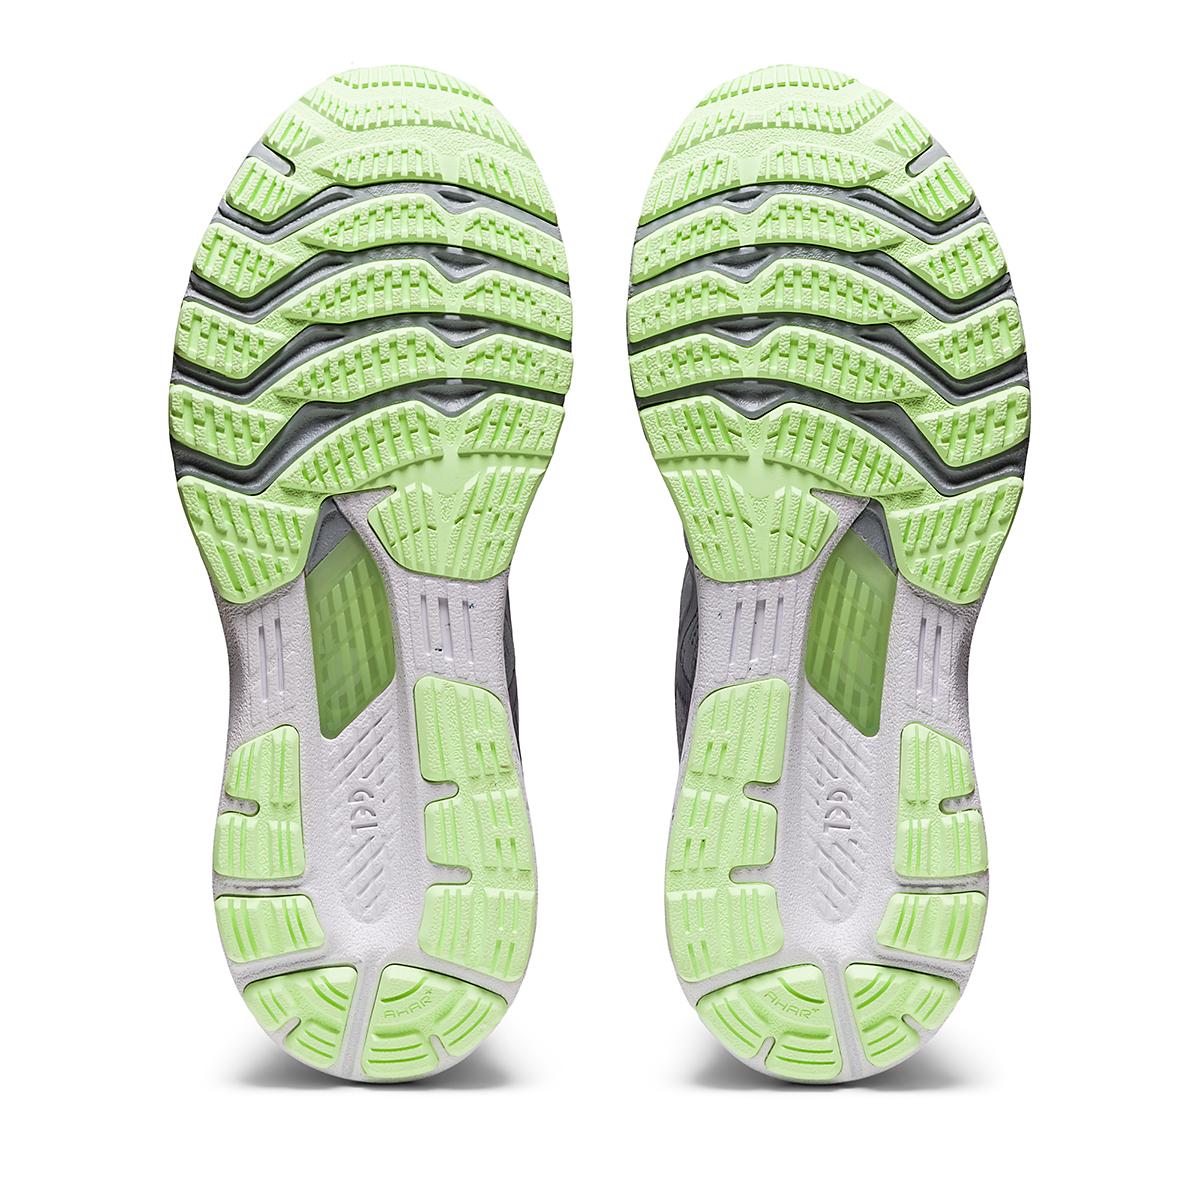 Women's Asics Gel-Kayano 28 Running Shoe - Color: Piedmont Grey/Lavender - Size: 5 - Width: Regular, Piedmont Grey/Lavender, large, image 7